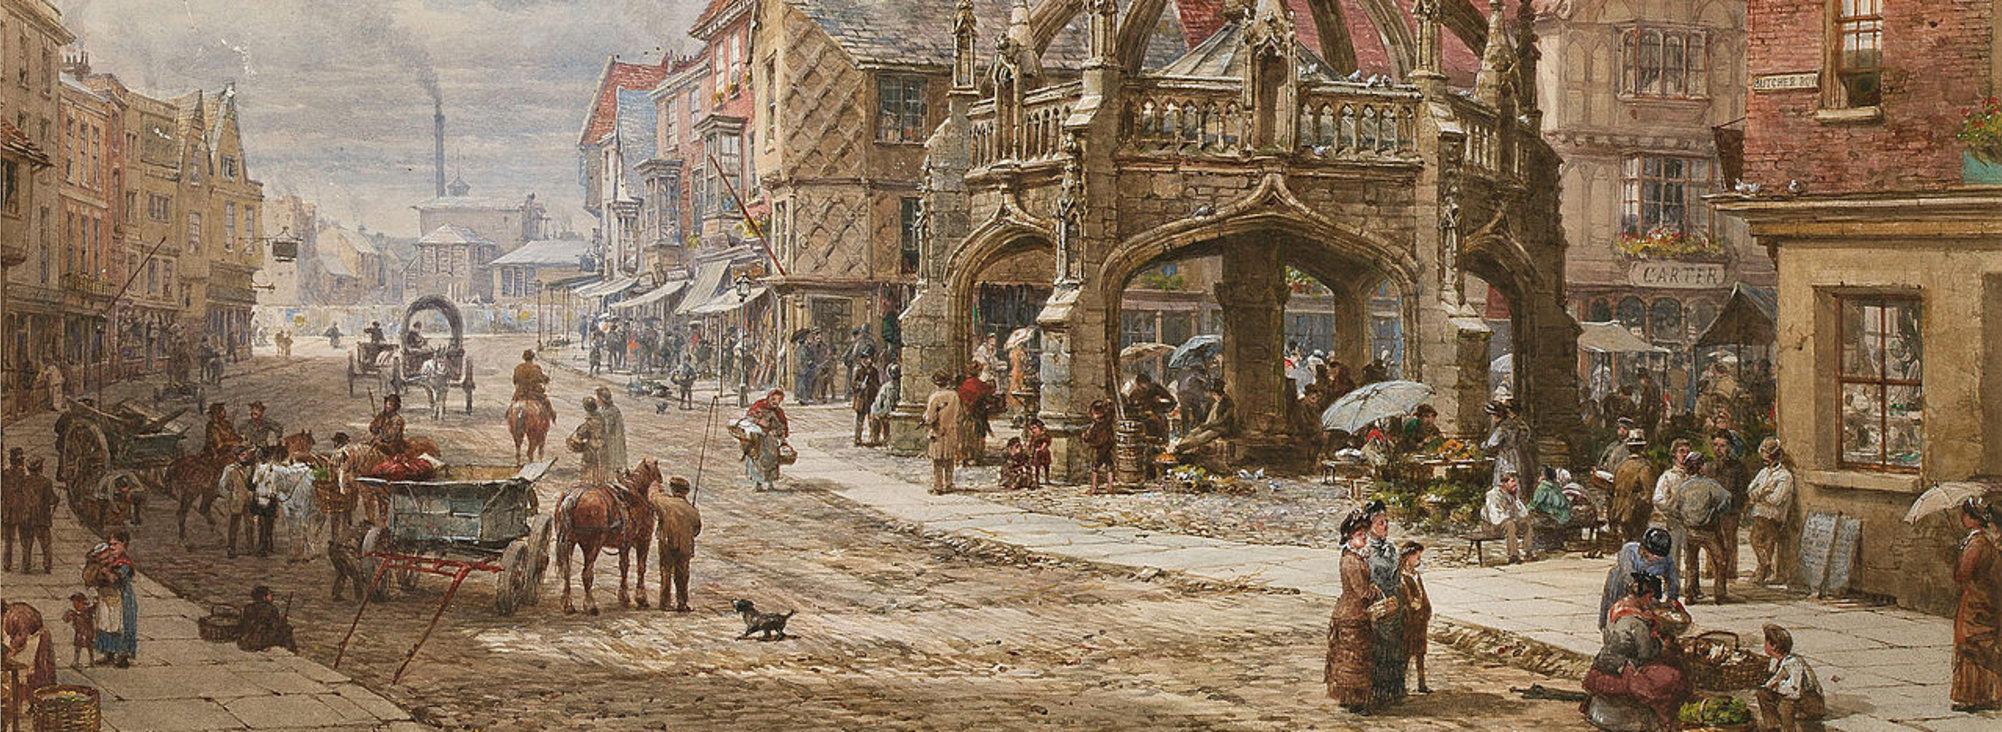 Louise Rayner Salisbury painting, 1820